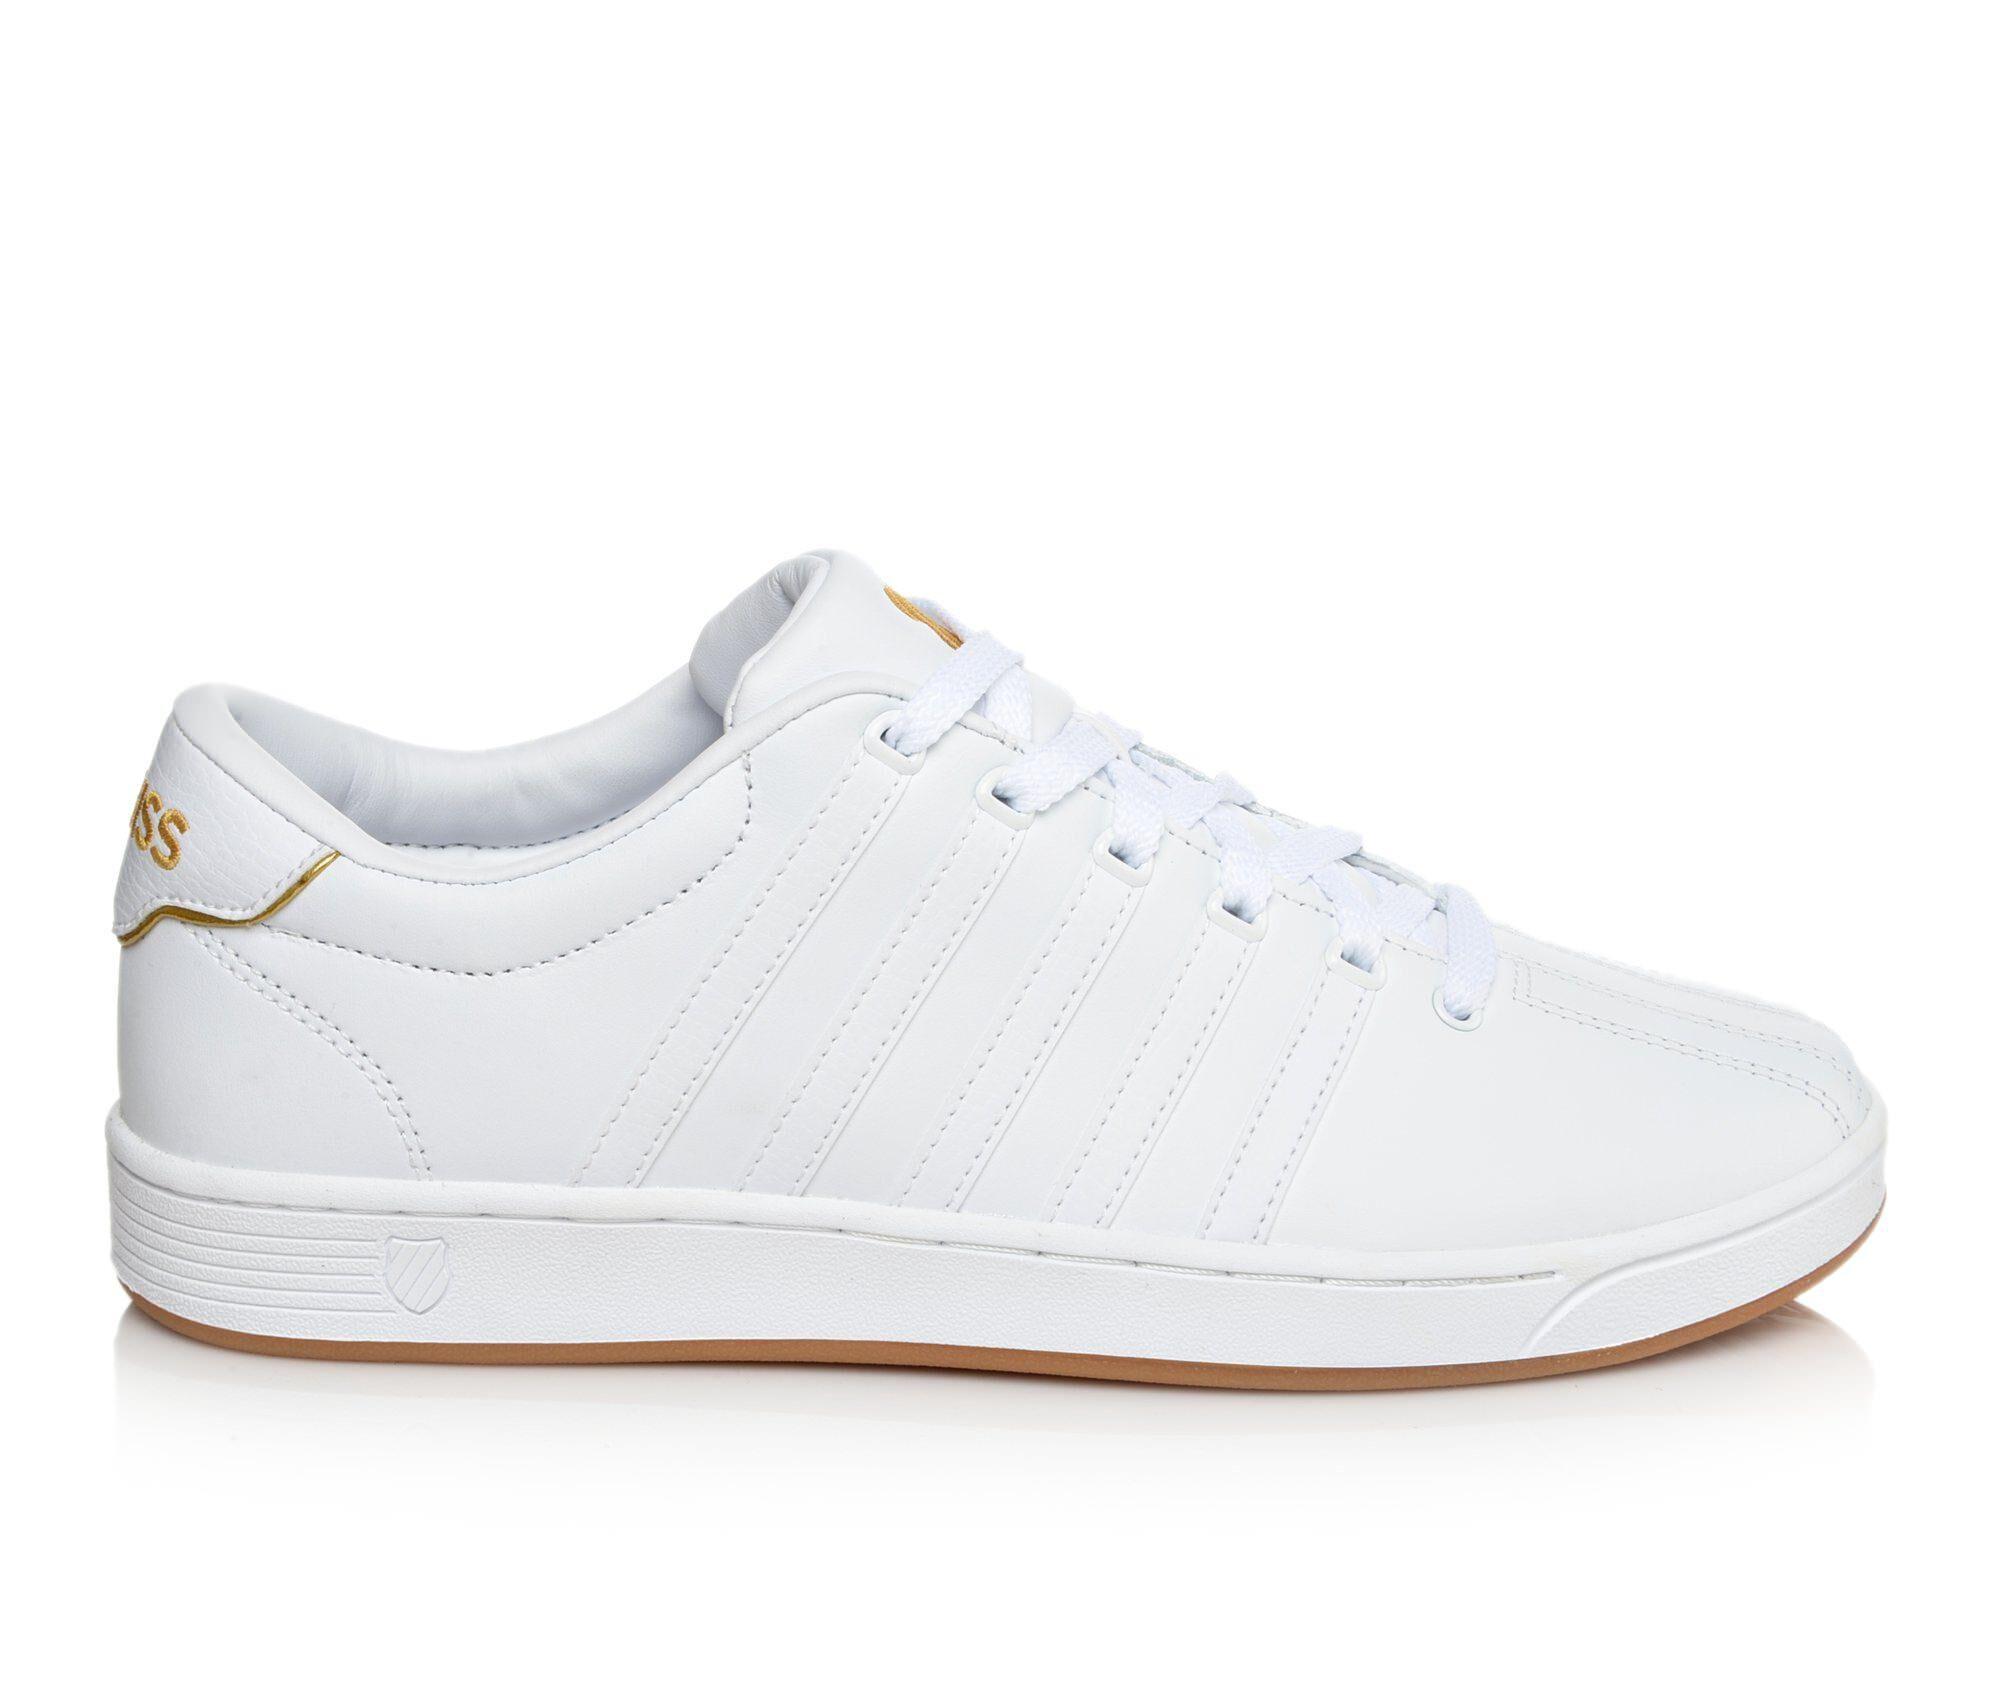 Men's K-Swiss Court Pro 2 Comfort Retro Sneakers discount footaction a1oWCZz